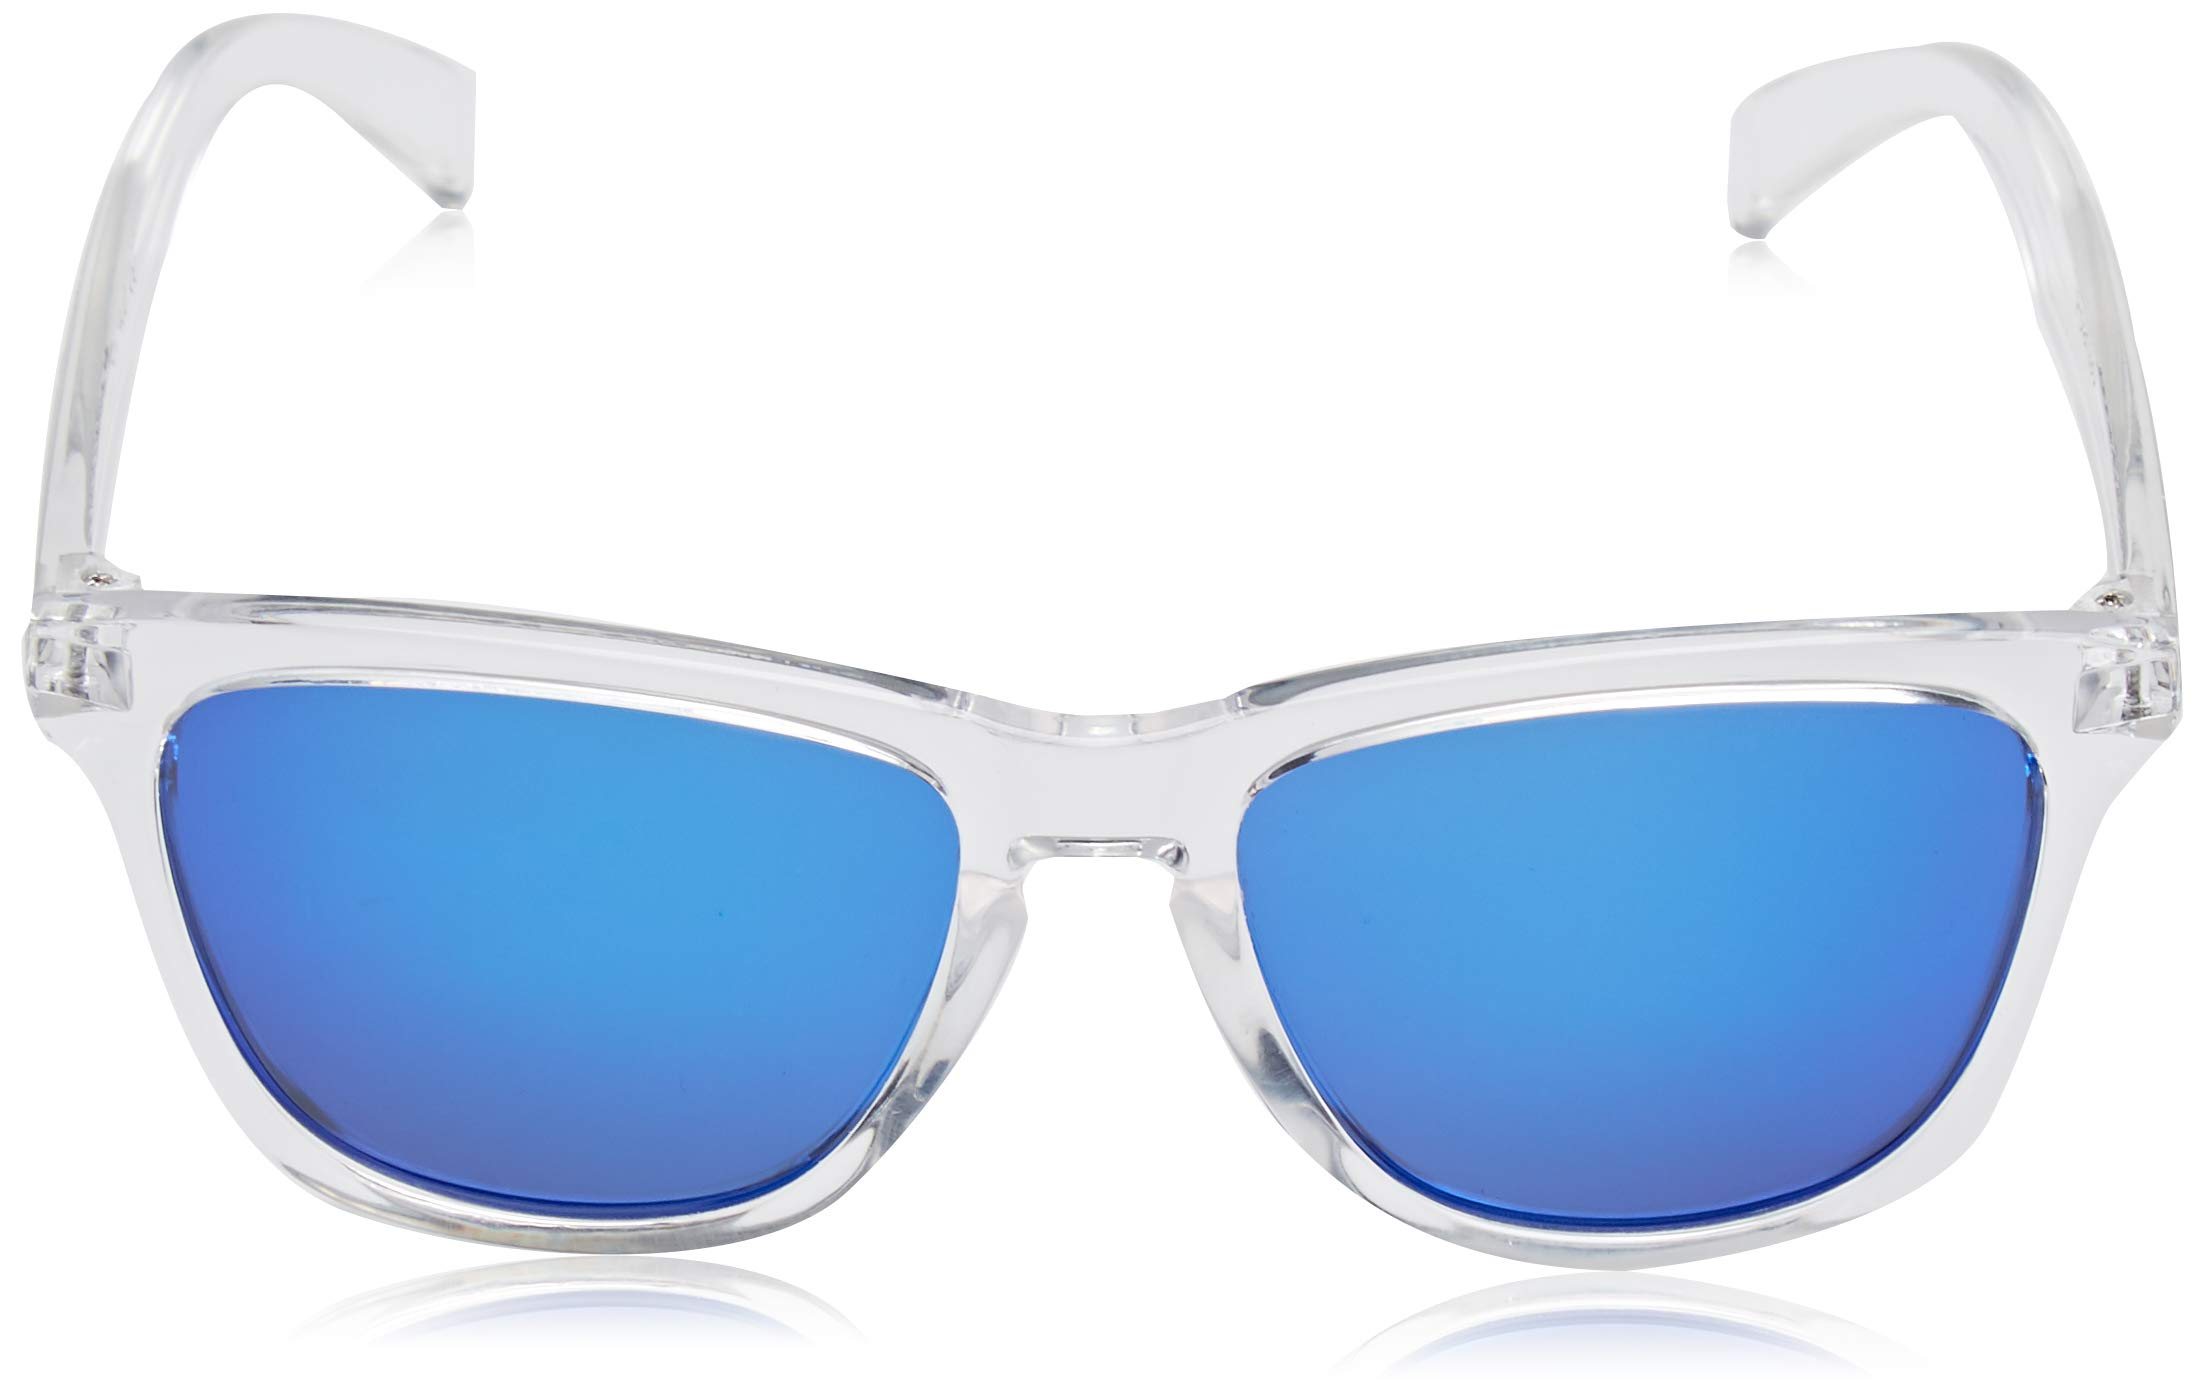 NORTHWEEK Kids Seabright - Gafas de Sol para Niño y Niña, Polarizadas, Translúcido/Azul 2